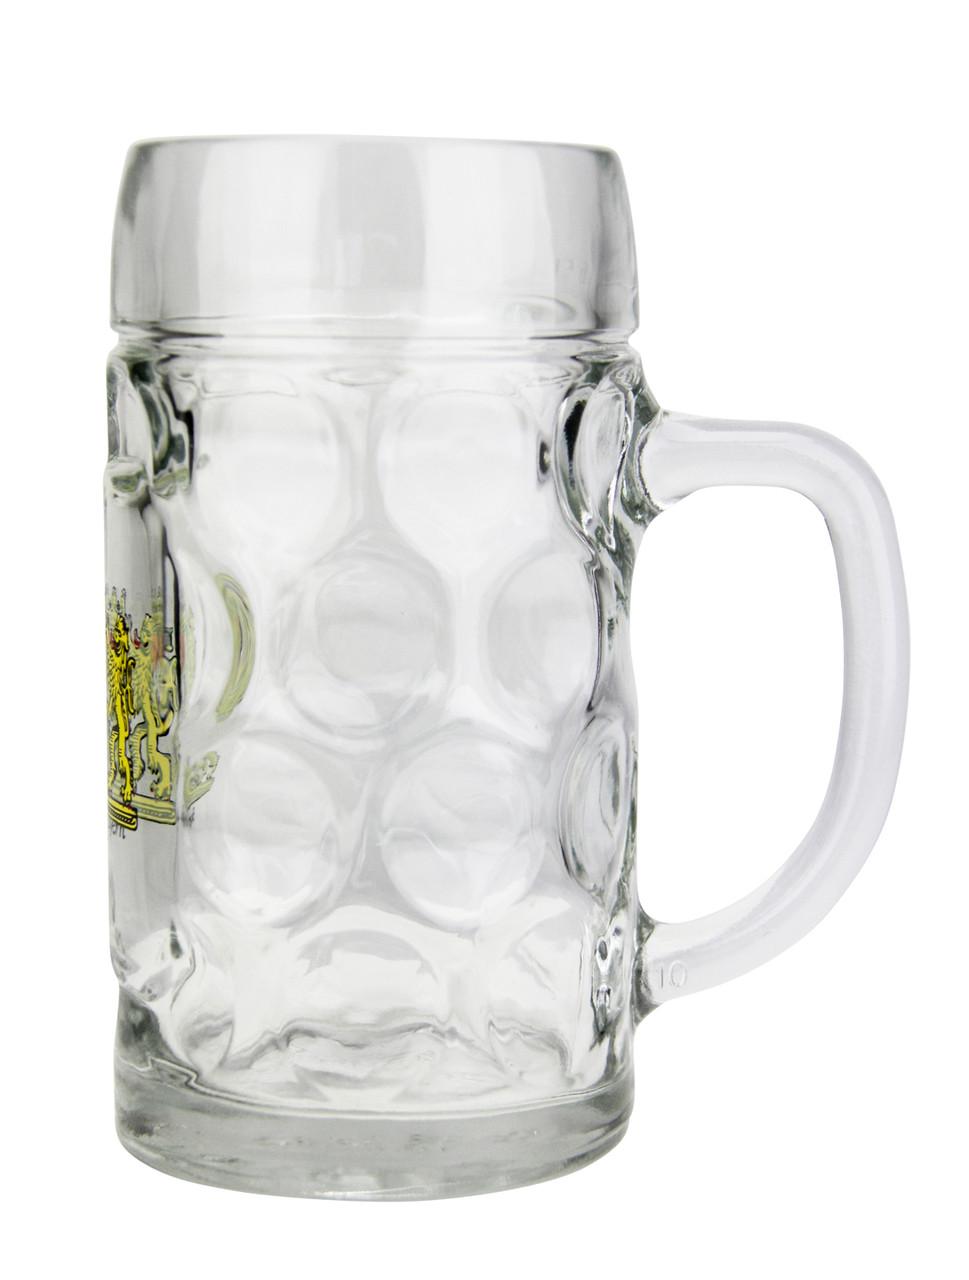 Traditional German Personalized Glass Beer Mug